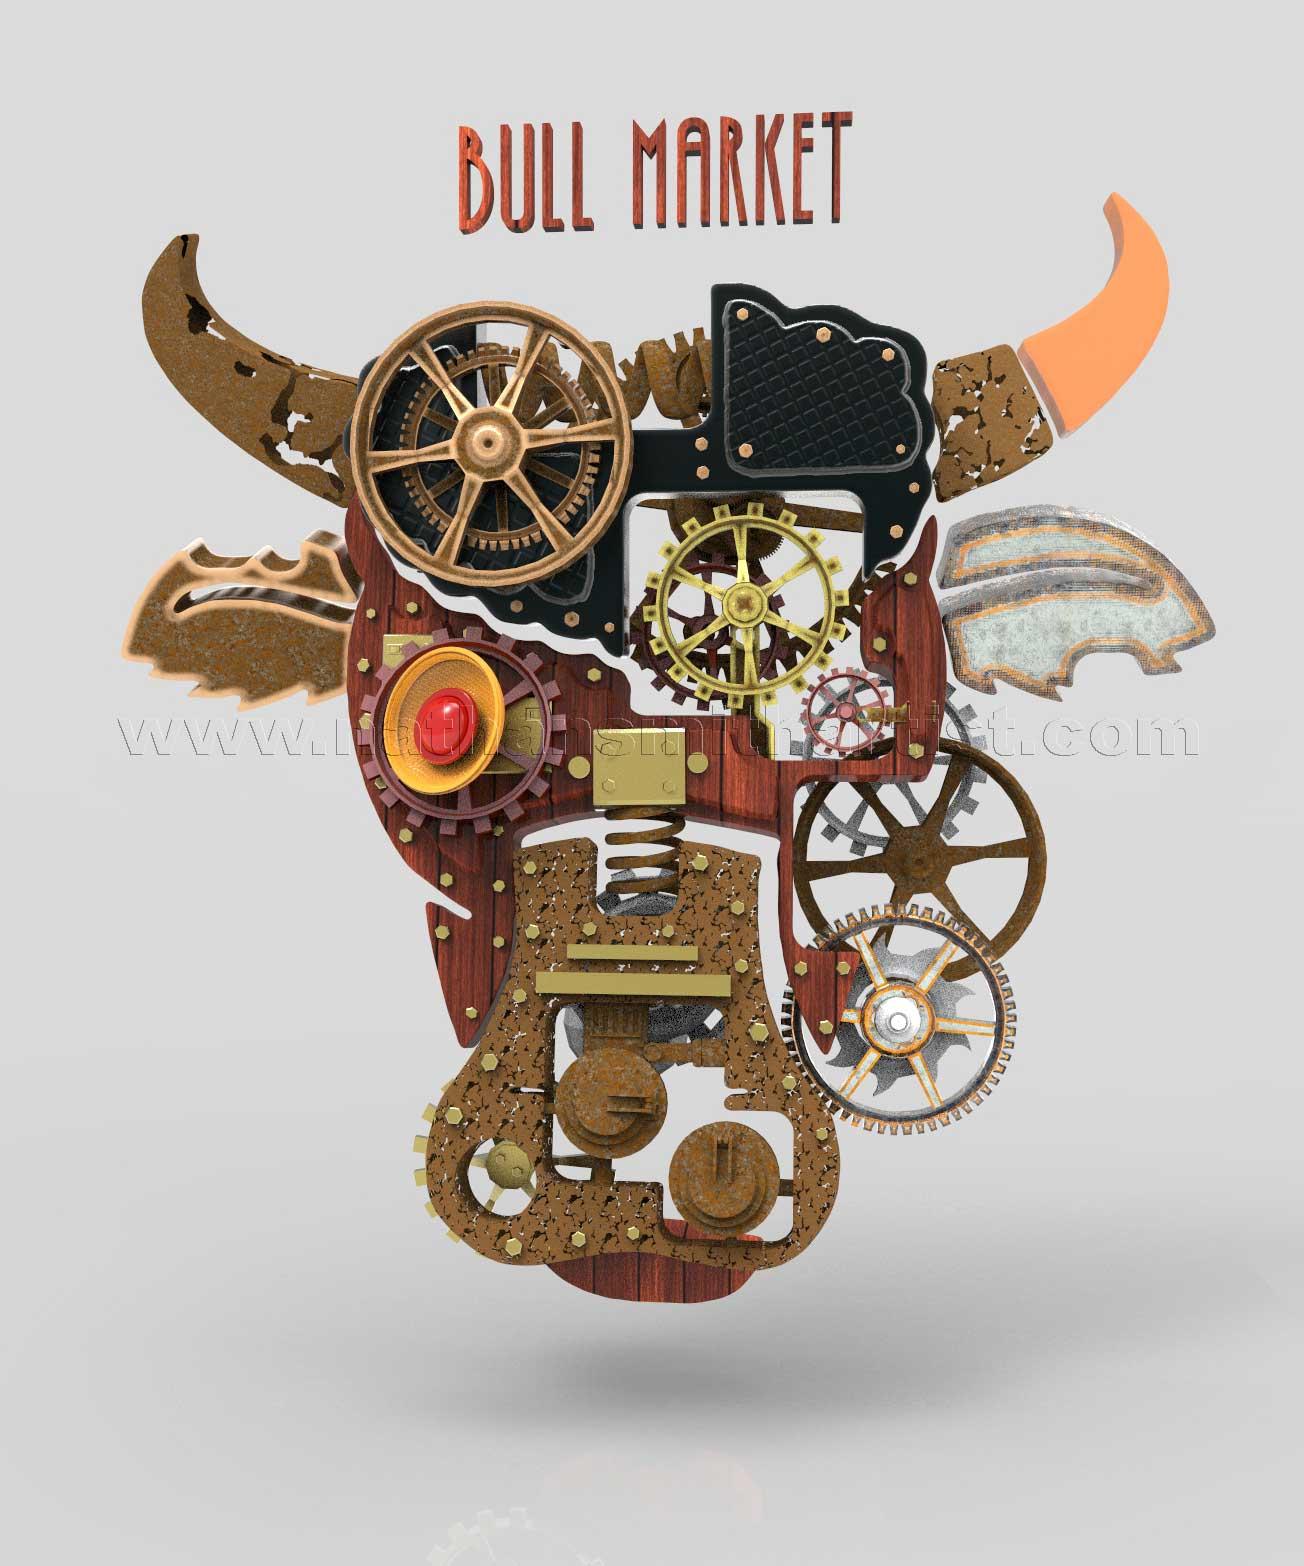 Bull Market,Cows